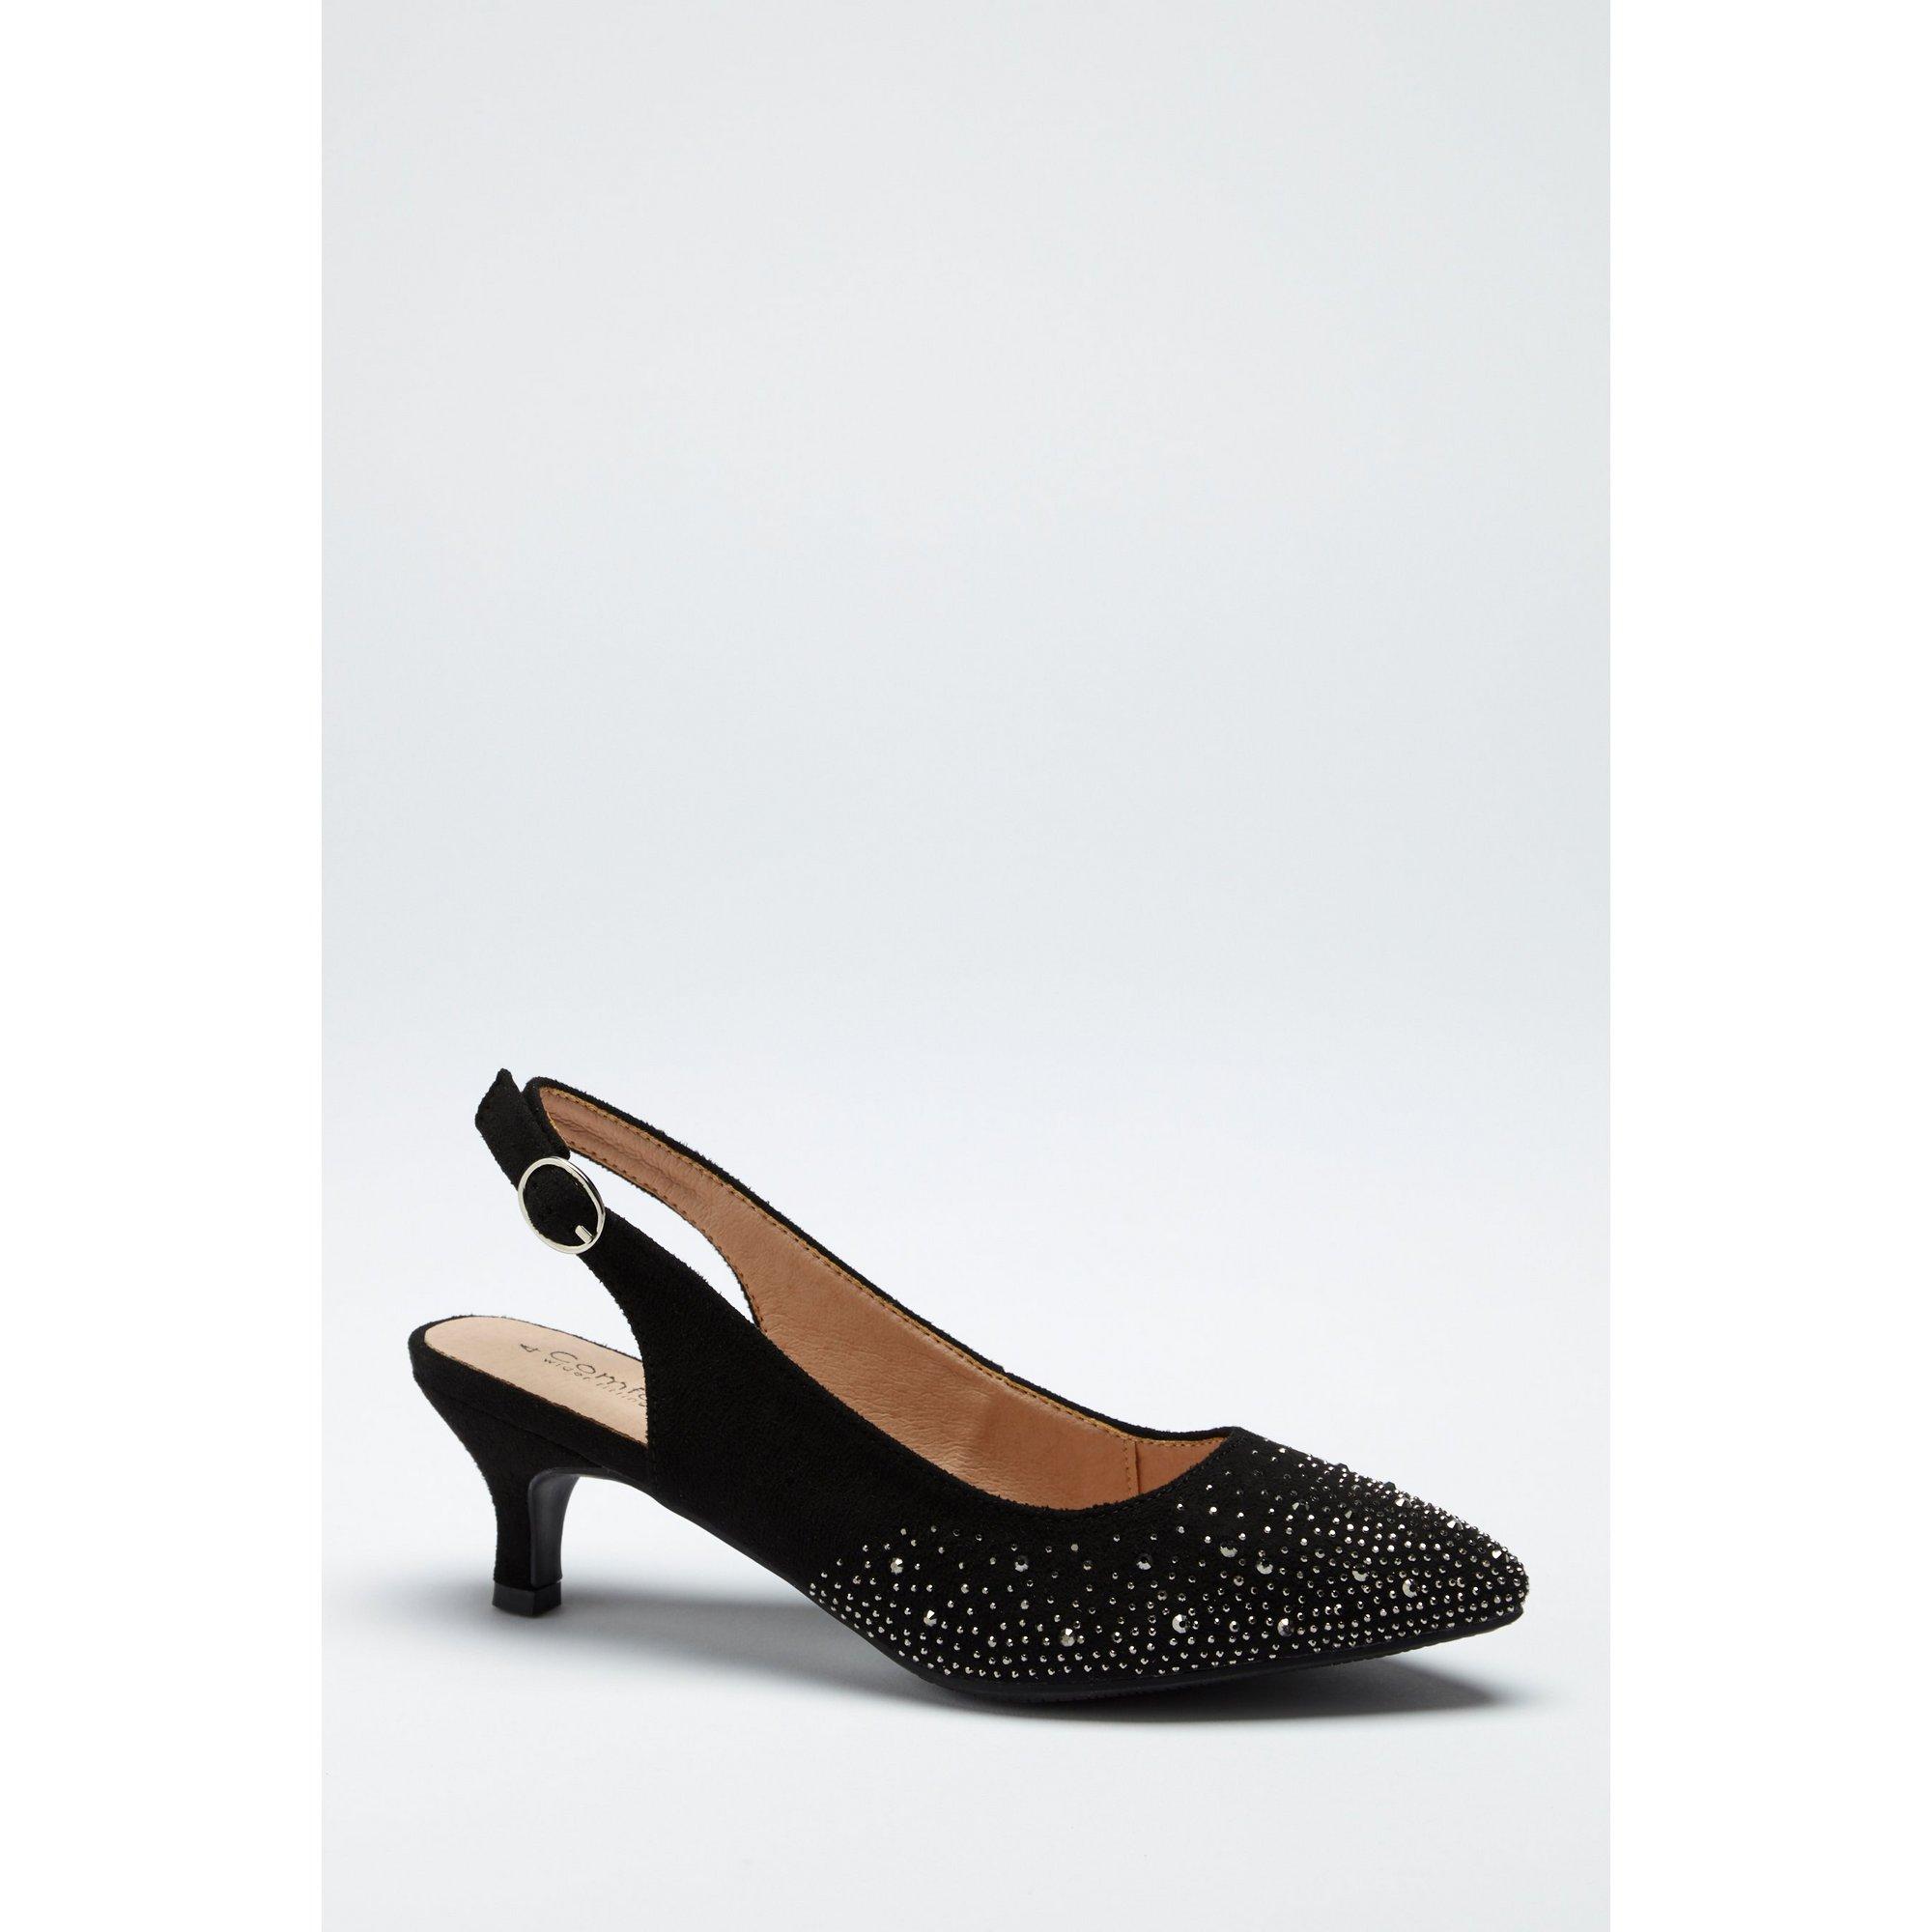 Image of Comfort Plus Diamante Black Sling Back Shoes